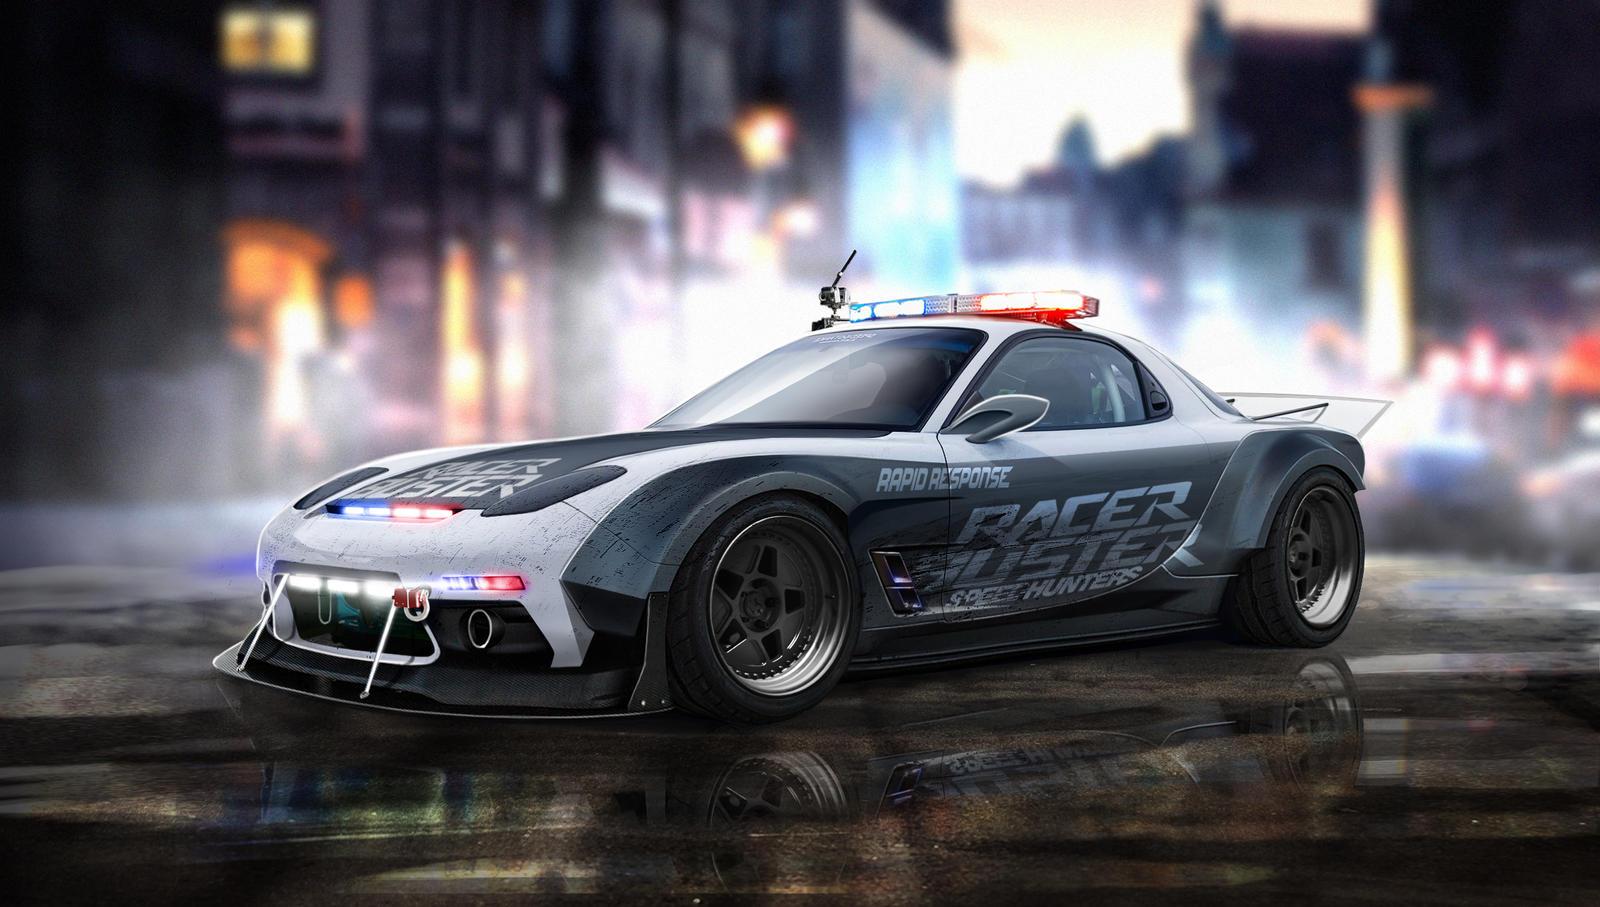 Mazda Rx7 by yasiddesign on DeviantArt